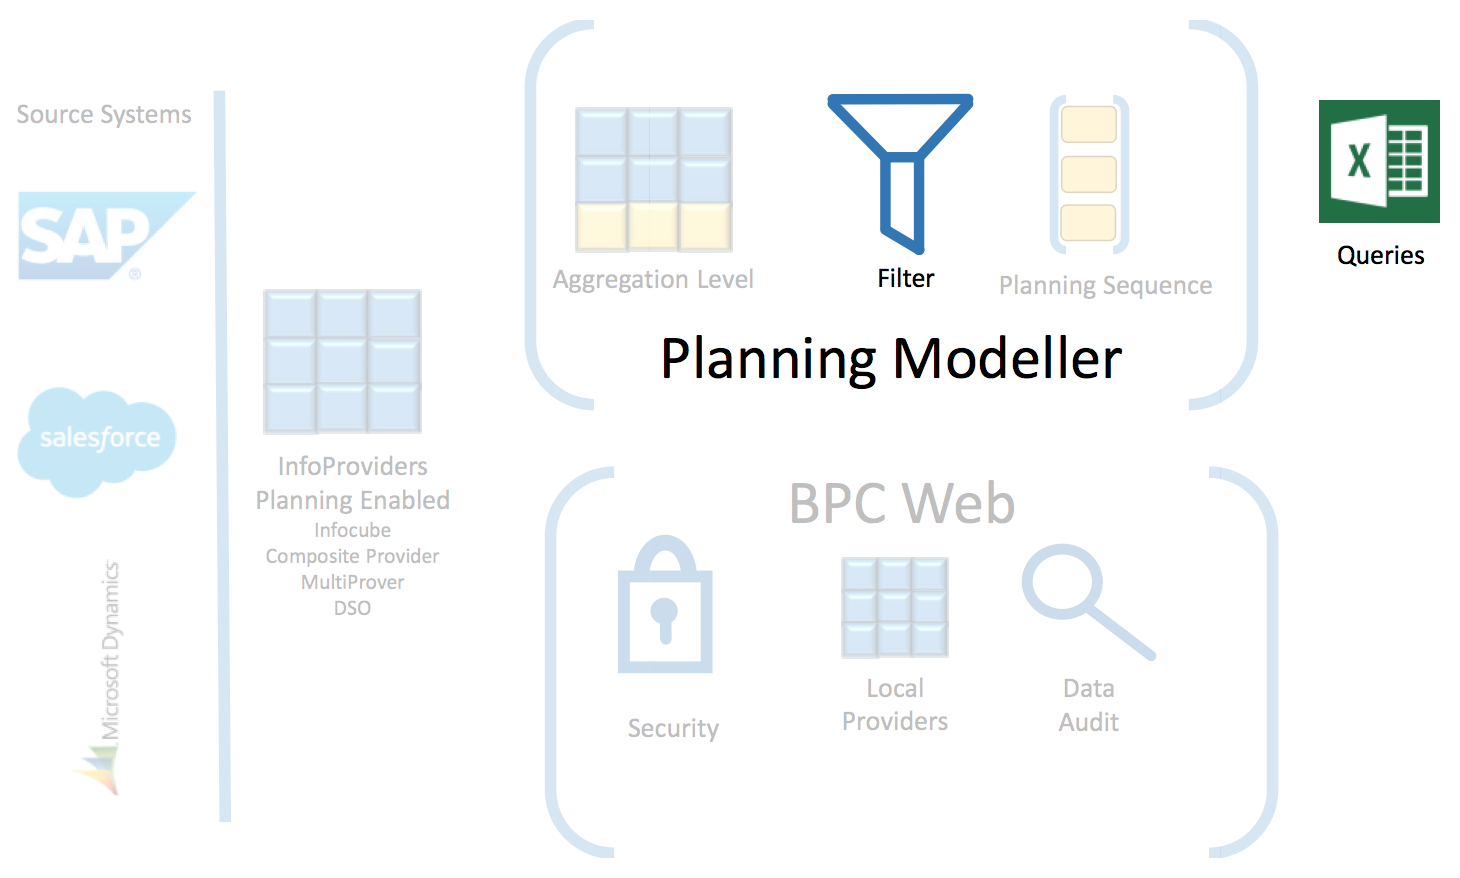 SAP BPC Architecture